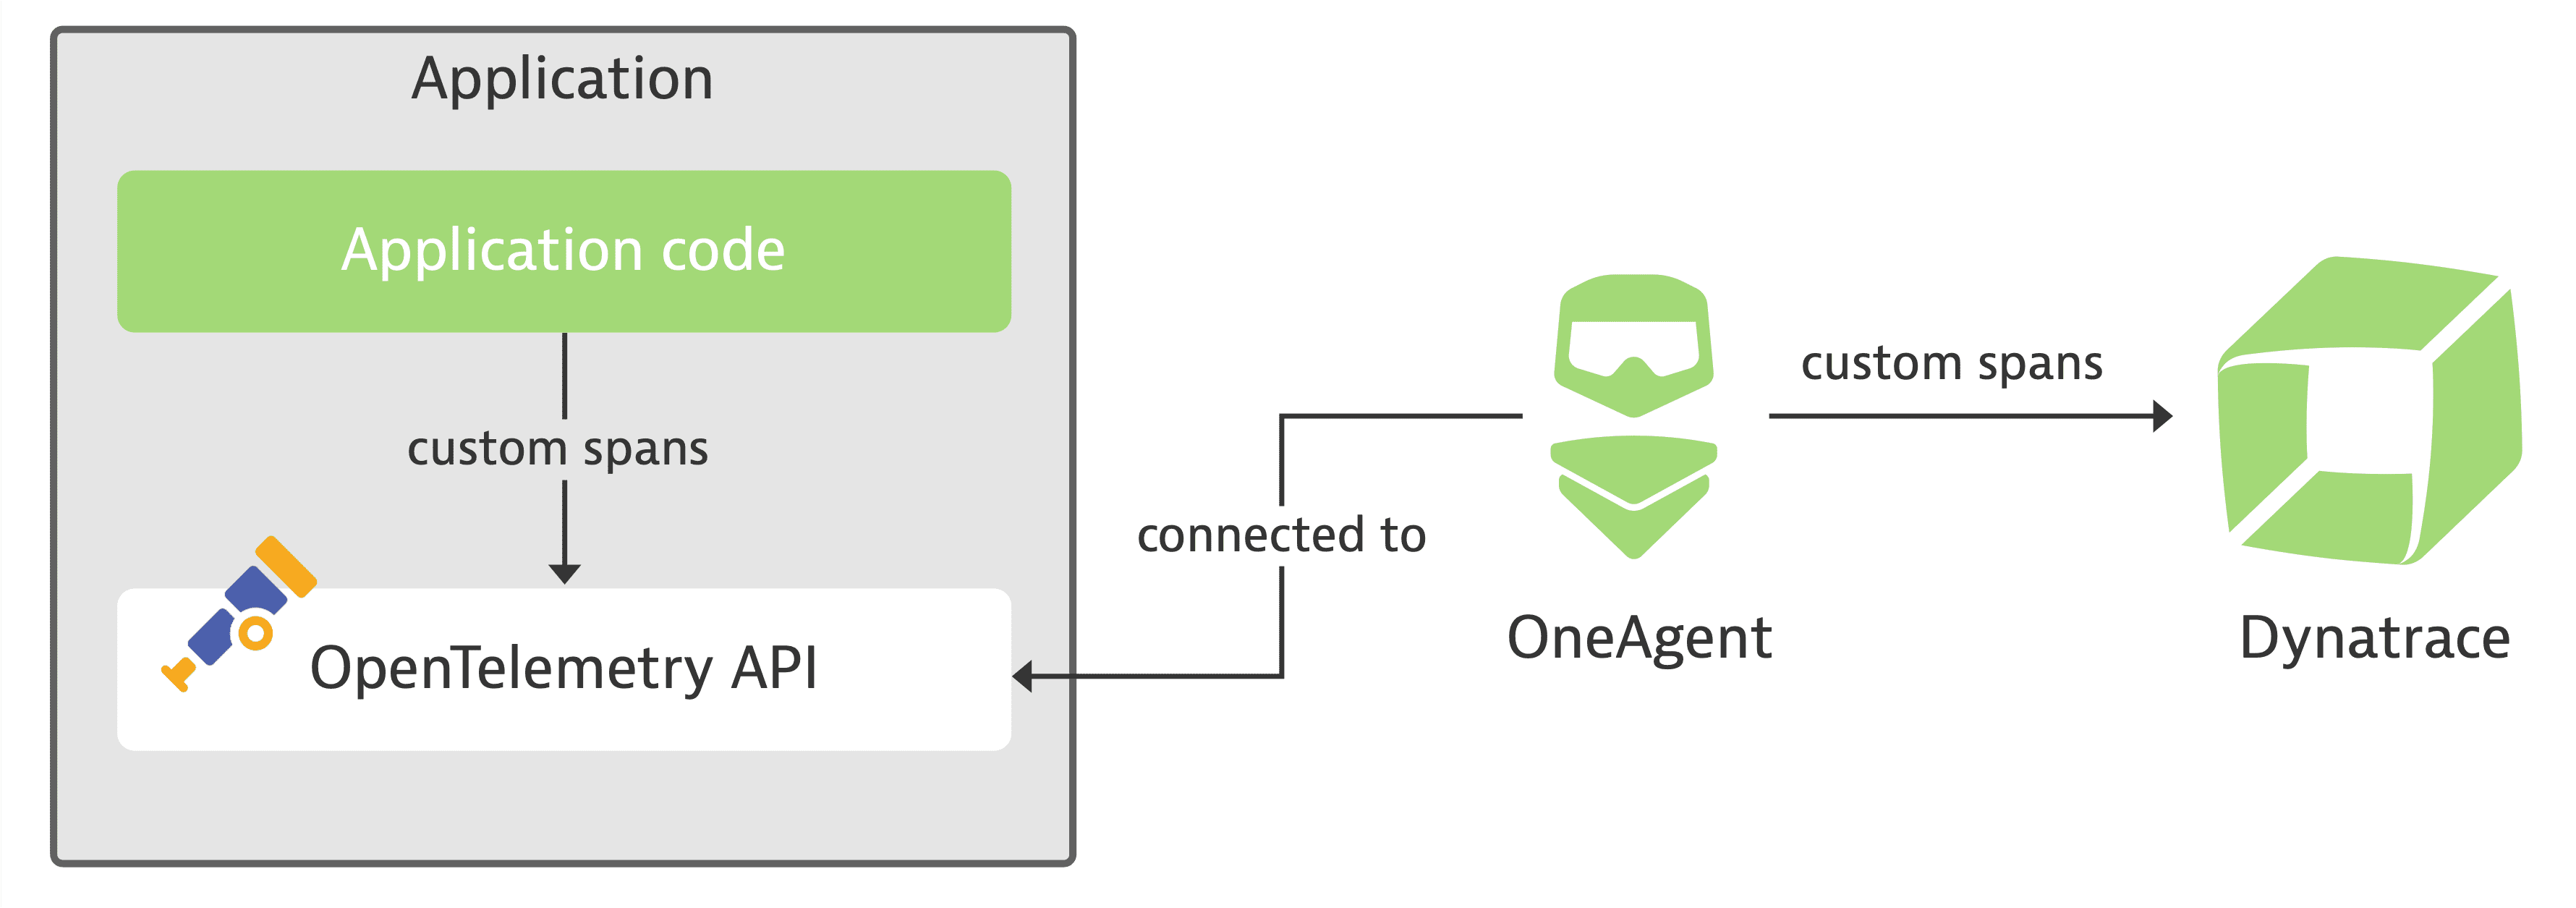 OpenTelemetry interoperability for Java code module on z/OS